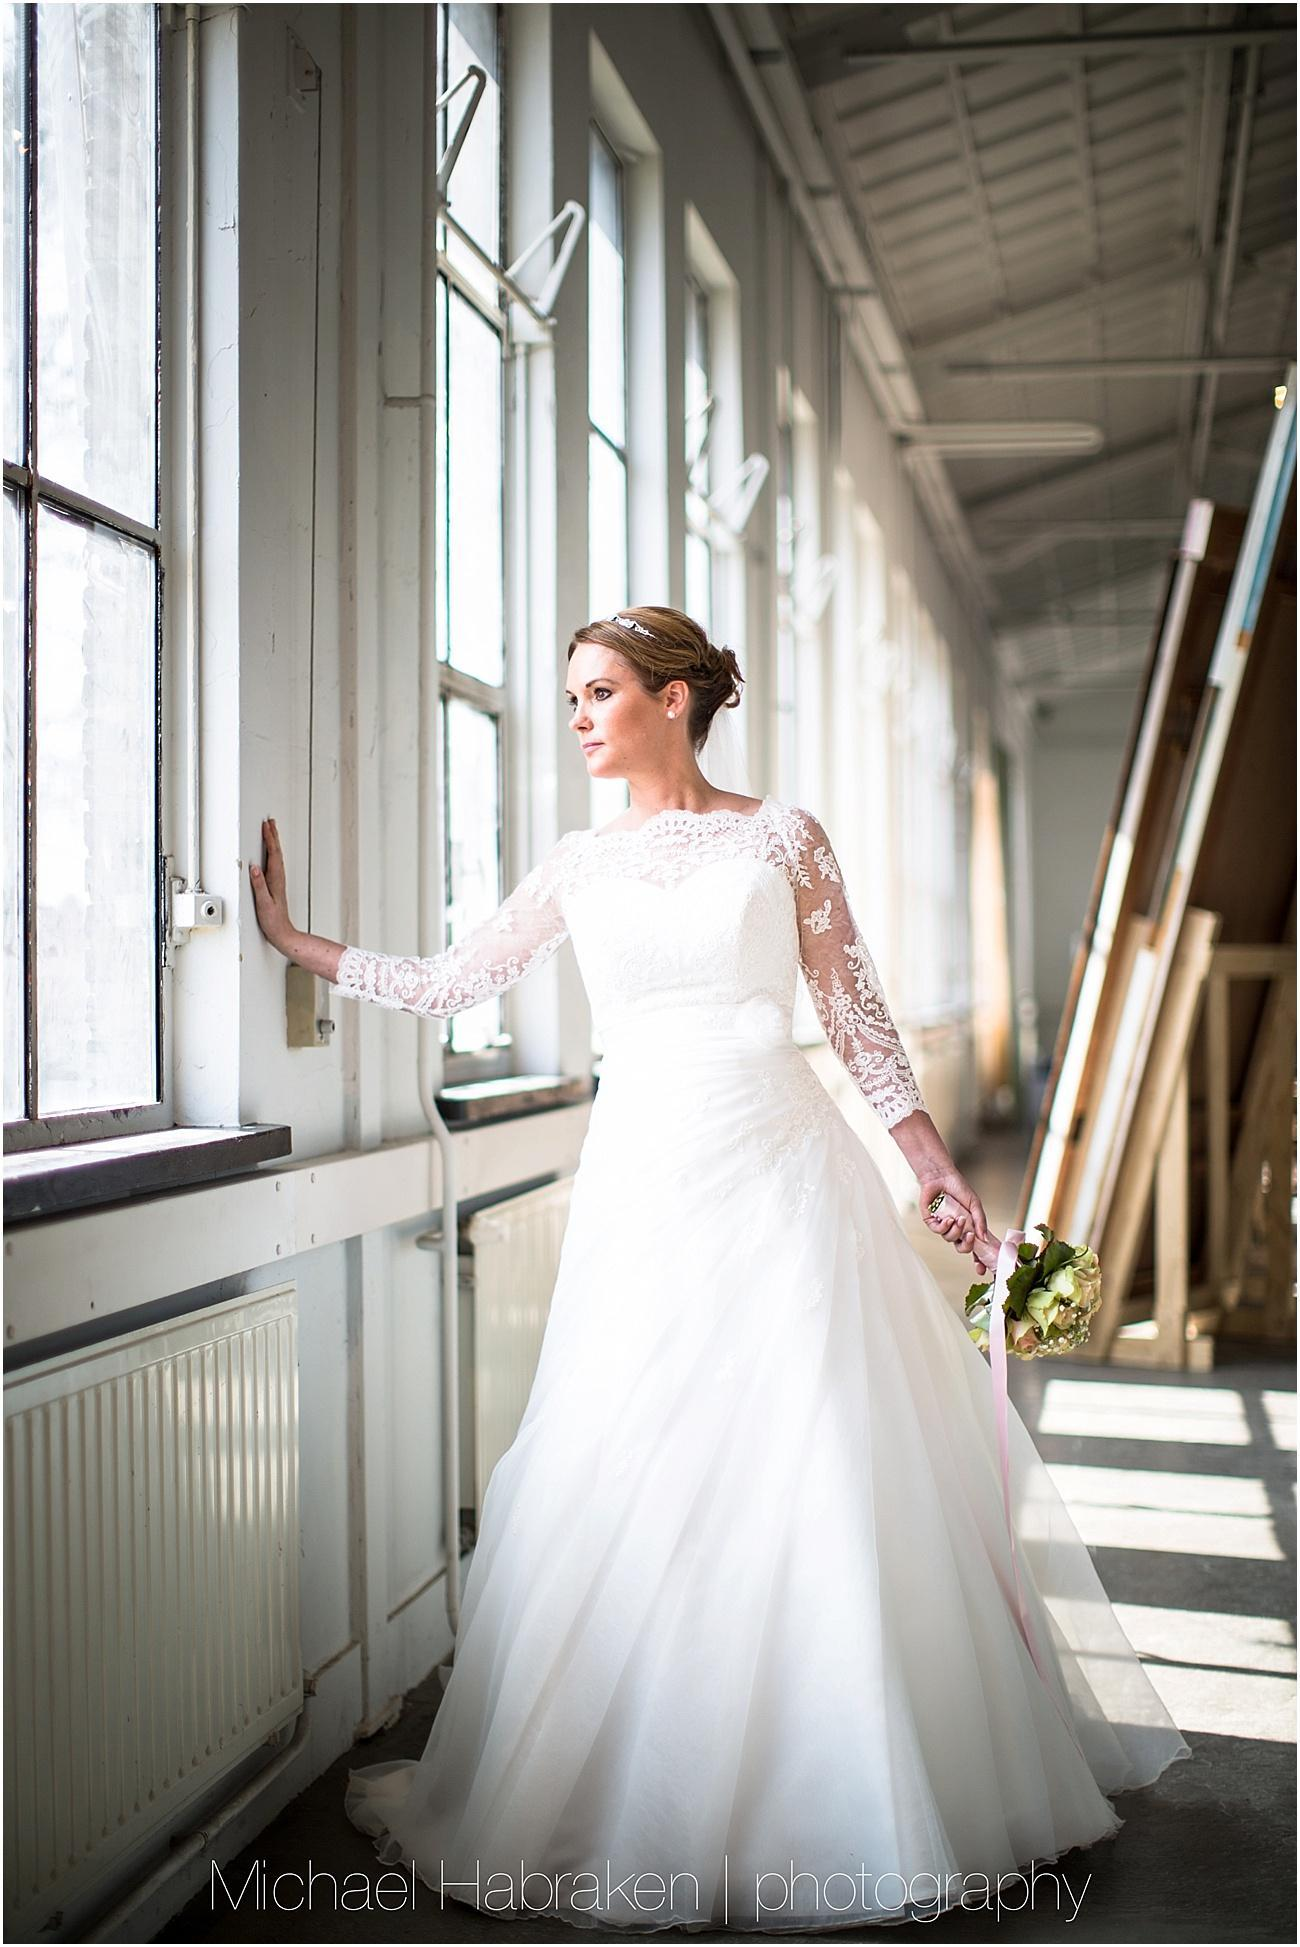 fotograaf Eindhoven, fotoshoot Piet Hein Eek, bruidsreportage Piet Hein Eek, trouwreportage Piet Hein Eek